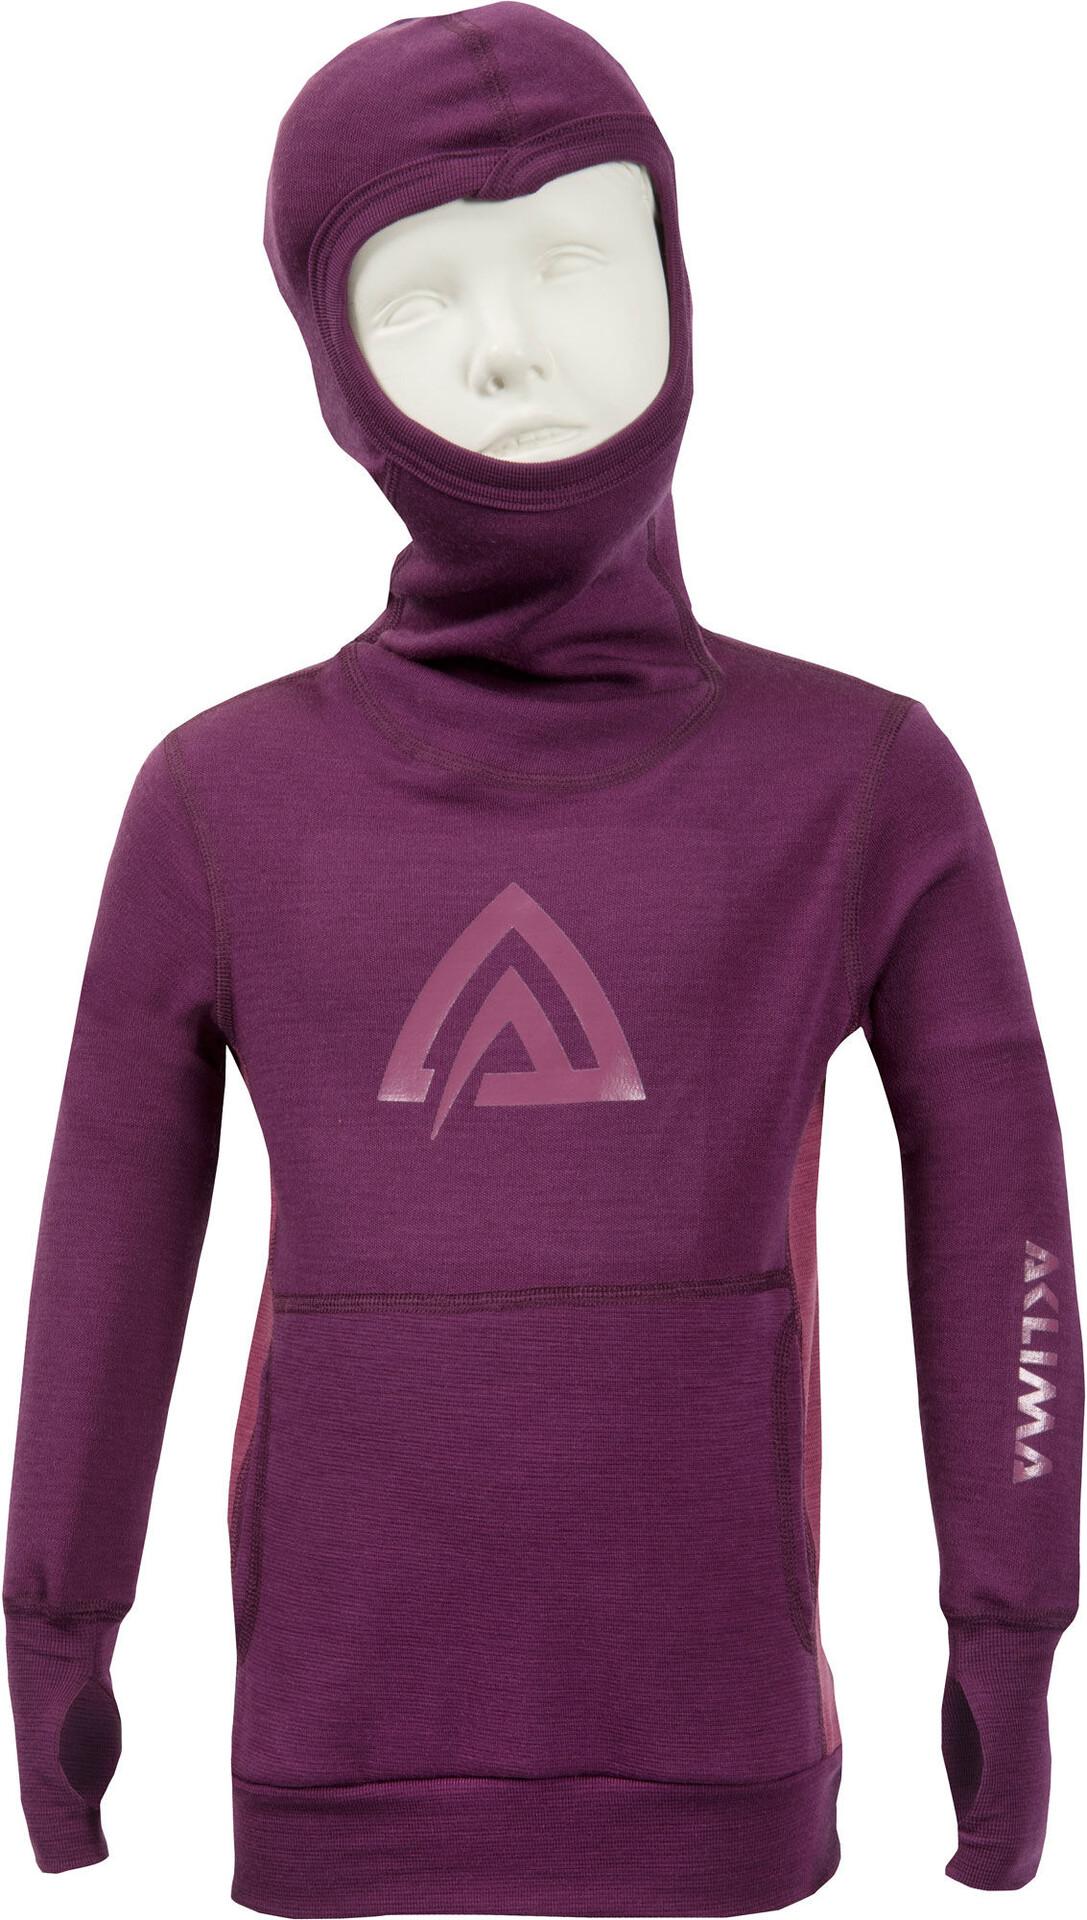 Aclima Kids WarmWool WarmWool WarmWool Hood Sweater Grape Wine/Damson 48507a